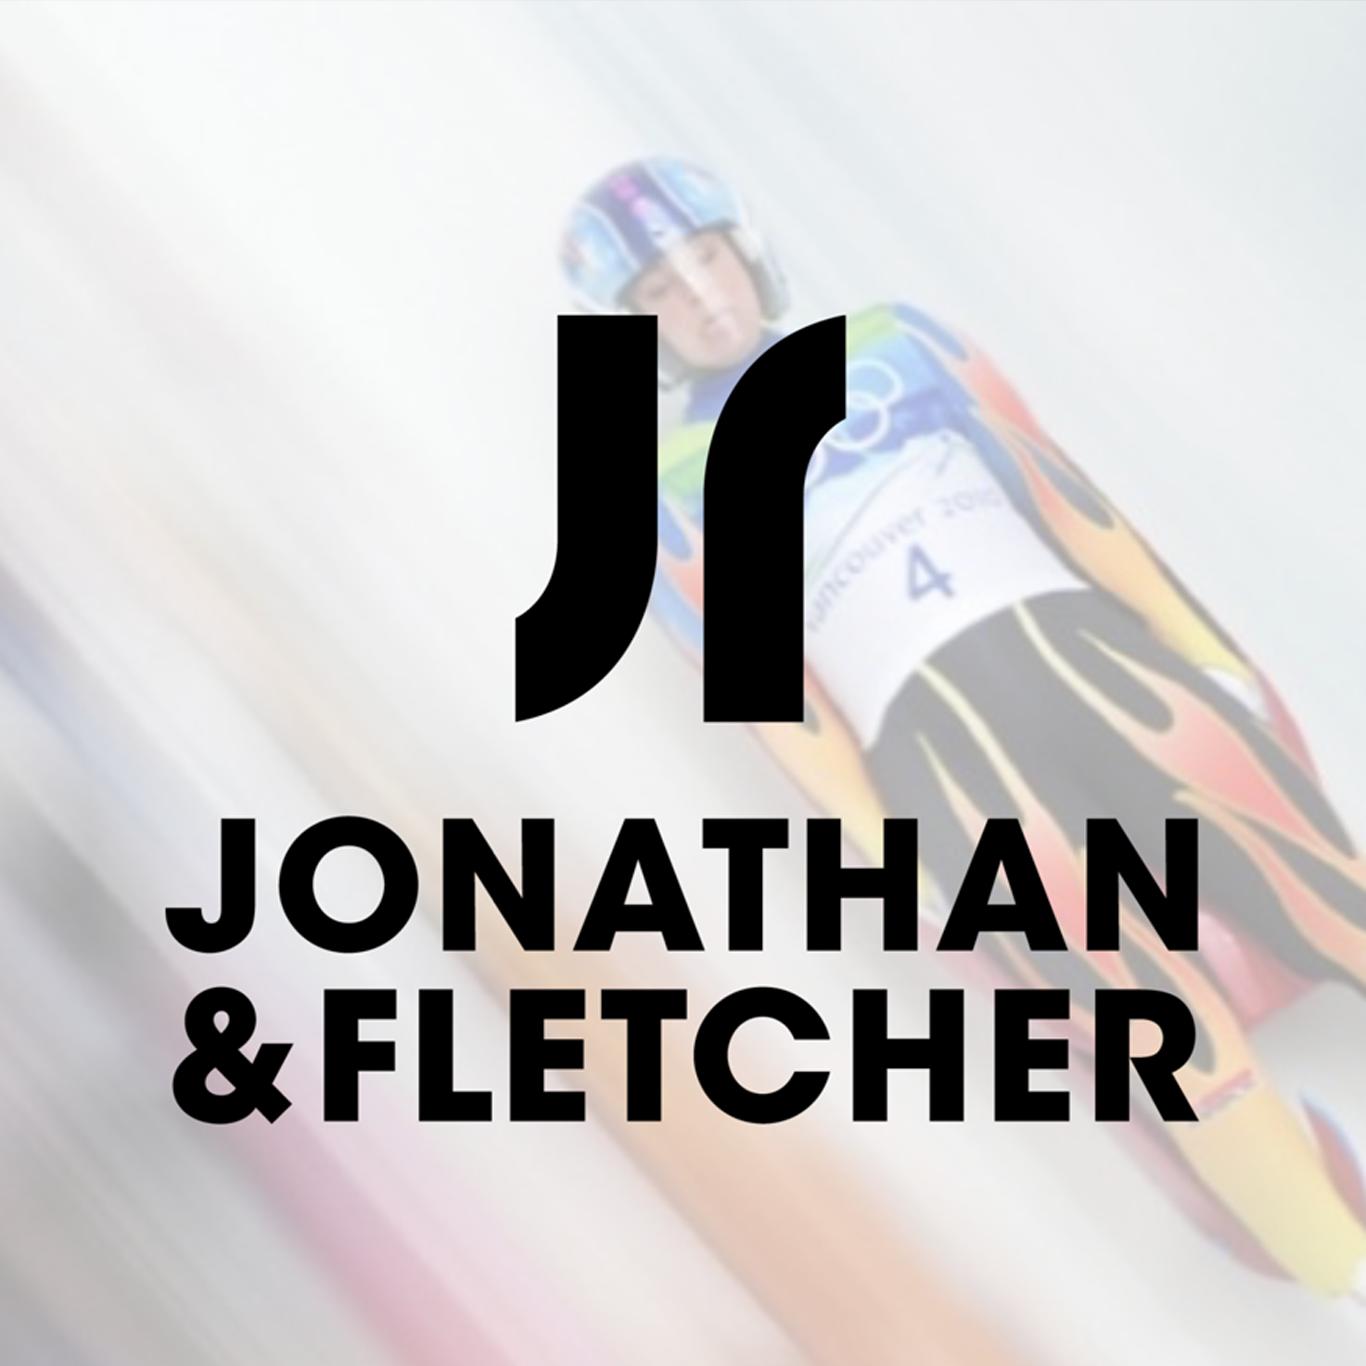 Jonathan & Fletcher portfolio image 1